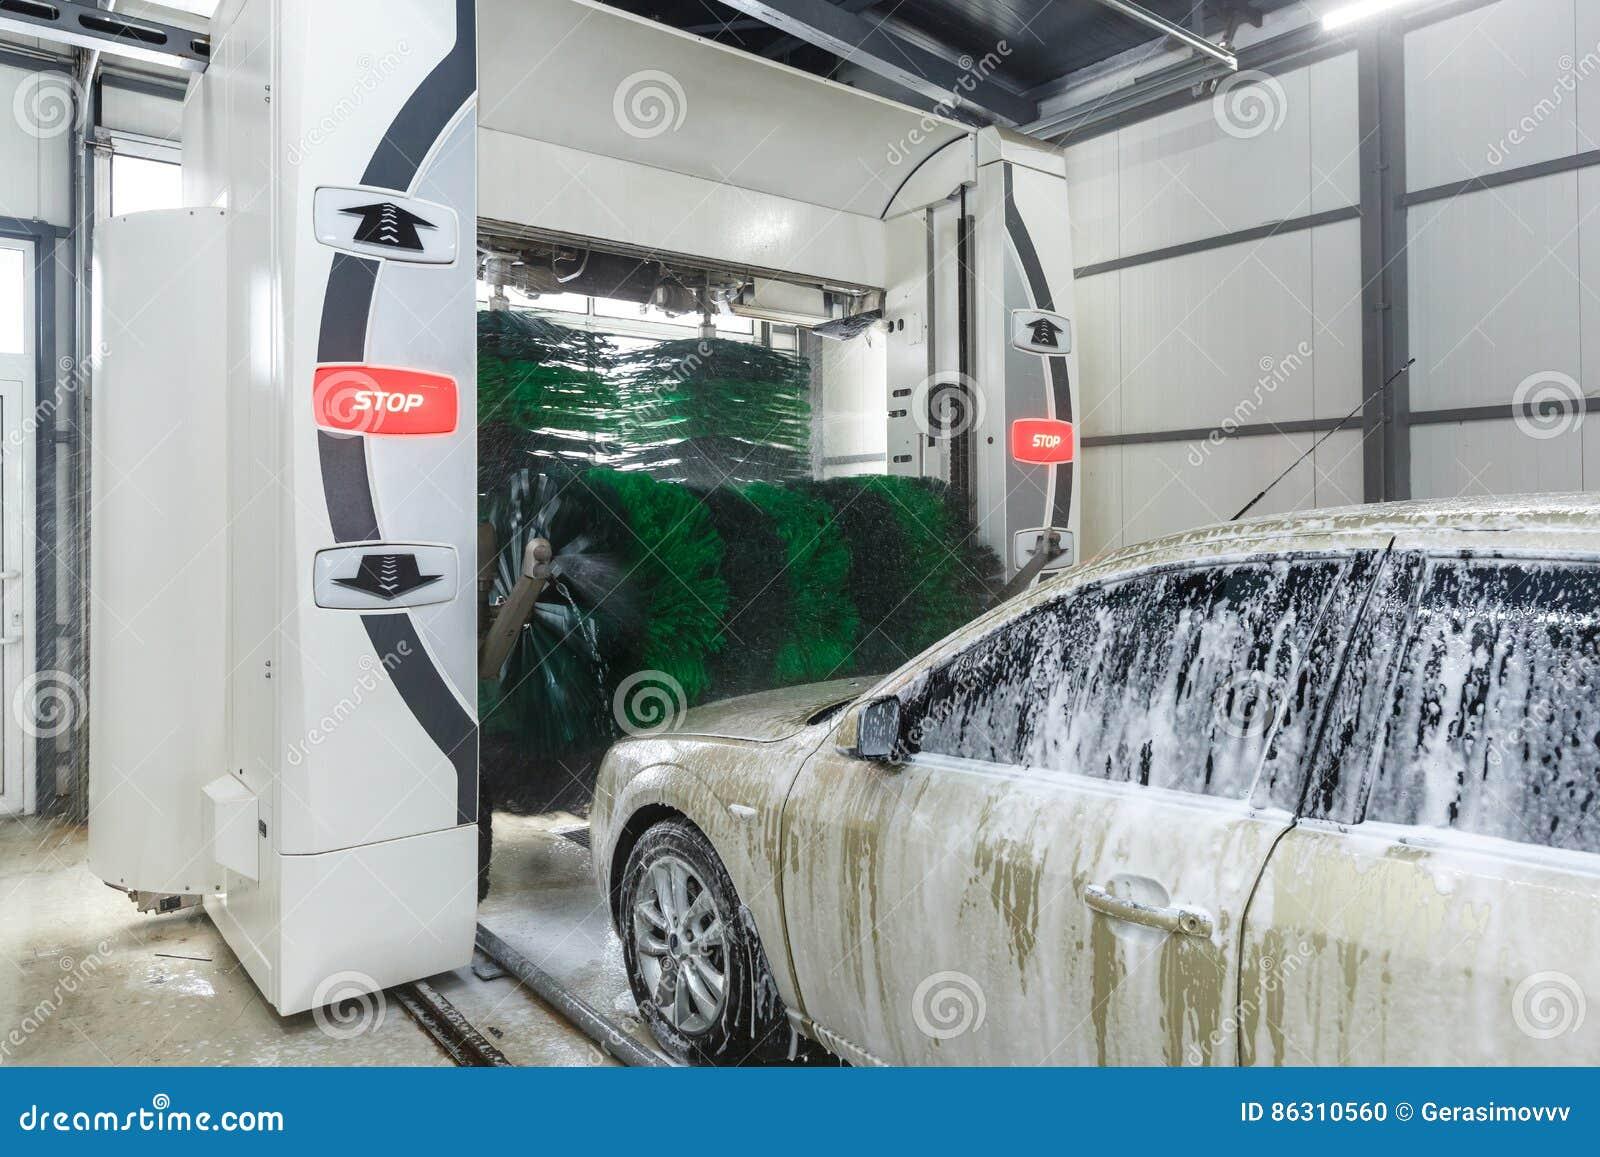 Automatic car washing stock photo  Image of automatic - 86310560